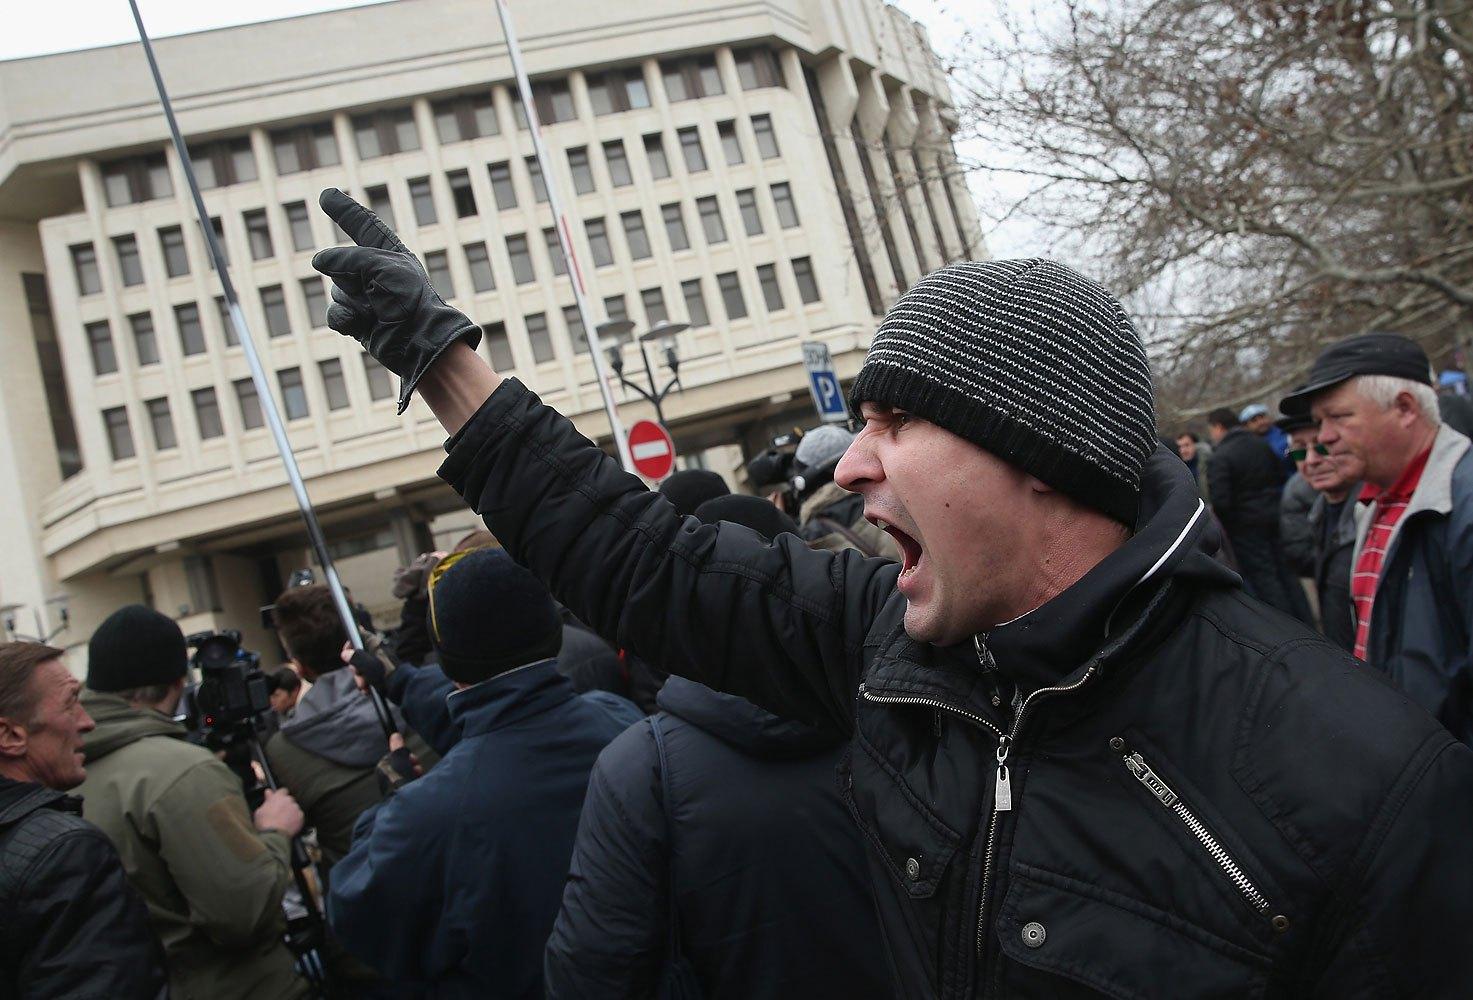 Pro-Russian supporters rally outside the Crimean parliament building on Feb. 28, 2014 in Simferopol.